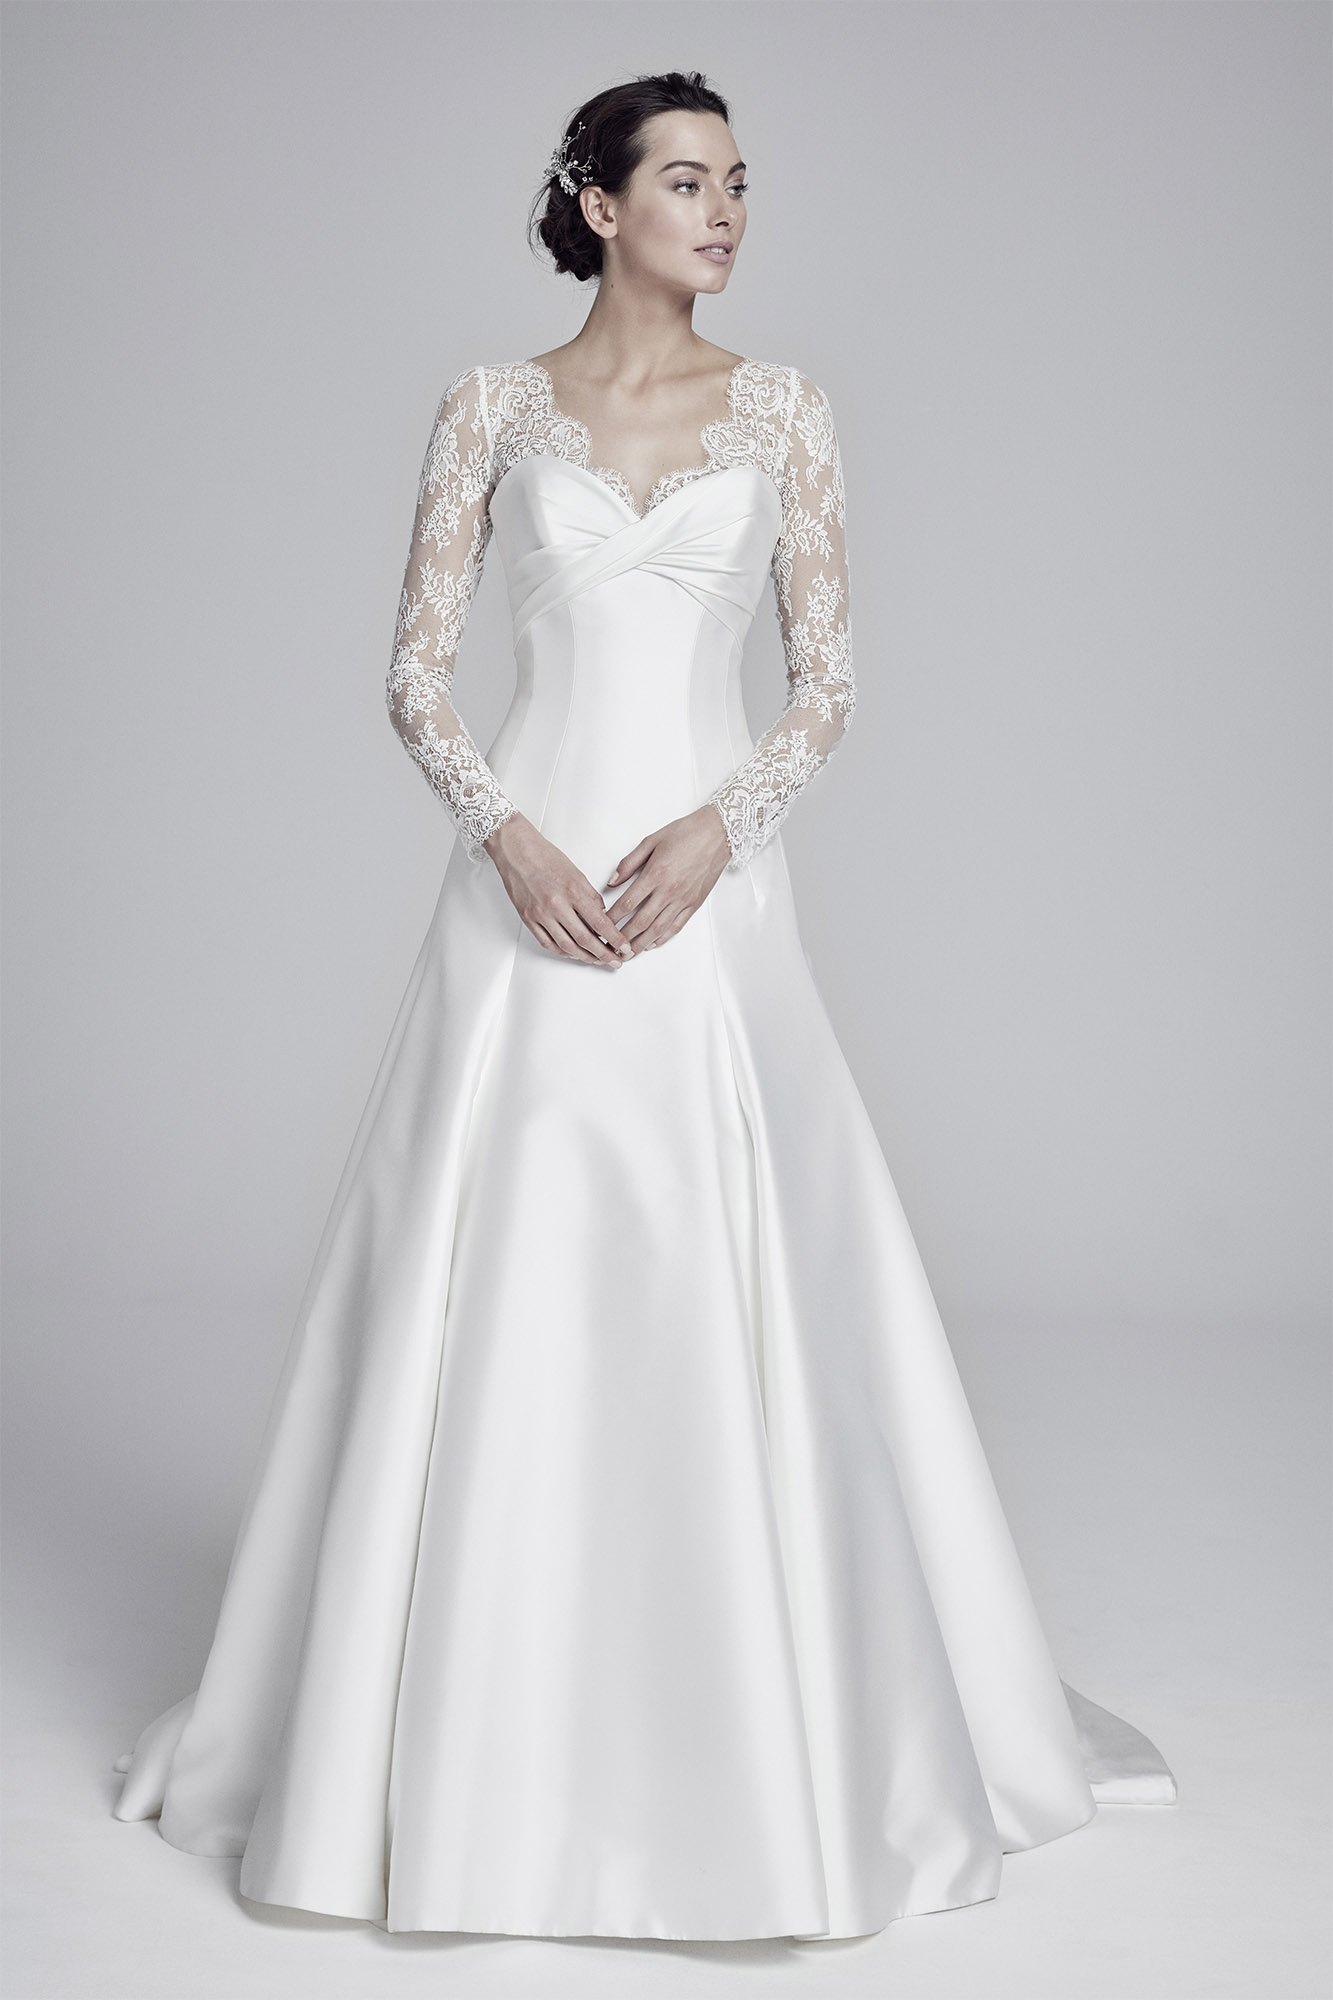 Livia Collections 2019 Lookbook UK Designer Wedding